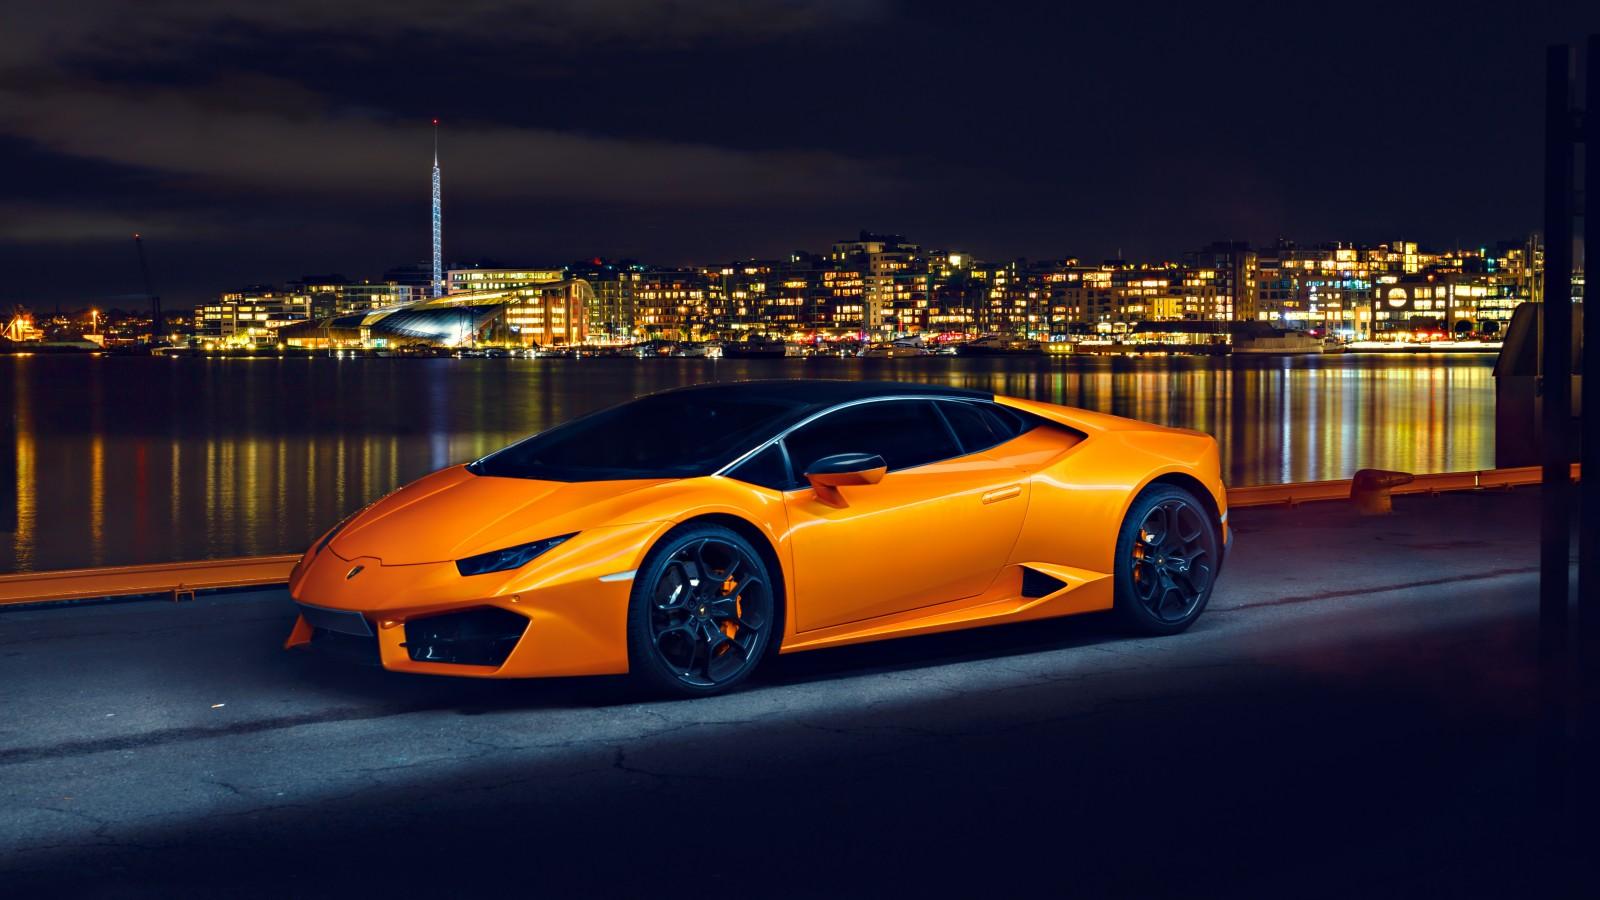 Top Iphone Wallpapers Hd Lamborghini Huracan Lp580 2 5k Wallpapers Hd Wallpapers